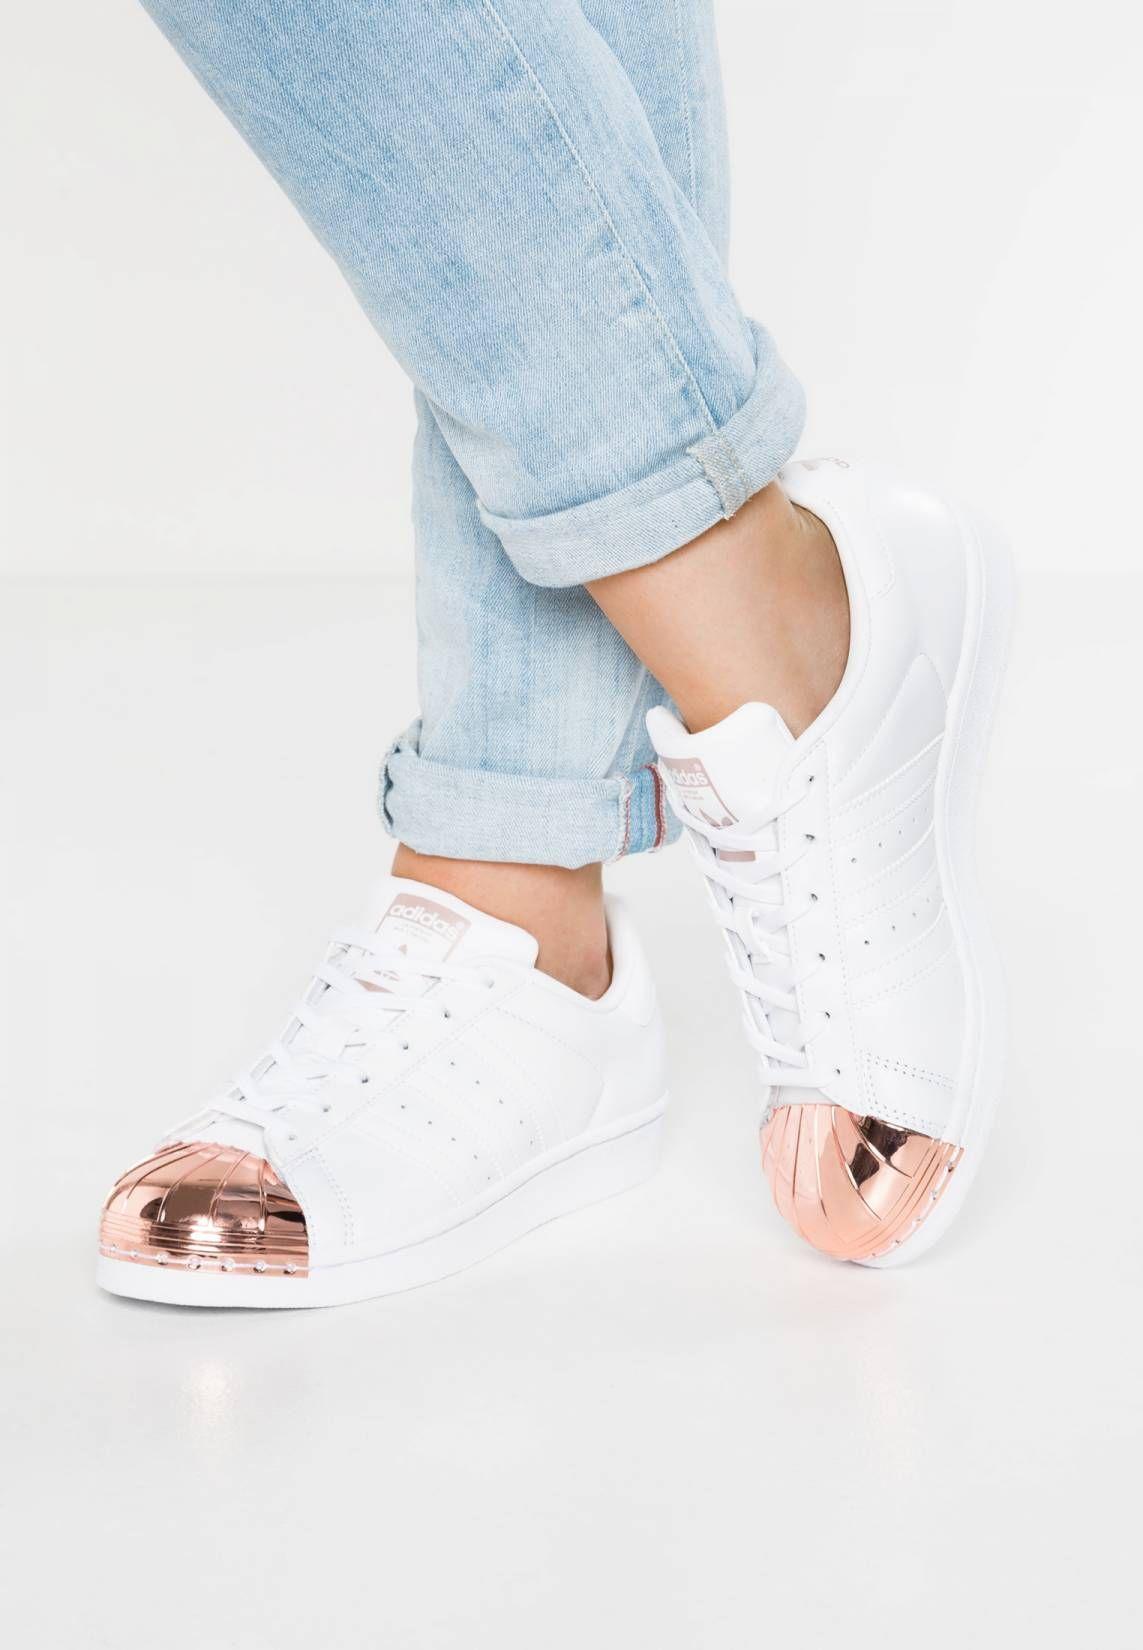 Sneakers OriginalsSUPERSTAR adidas basse OriginalsSUPERSTAR whitecopper Sneakers basse adidas Sneakers basse OriginalsSUPERSTAR adidas whitecopper uTK35clF1J